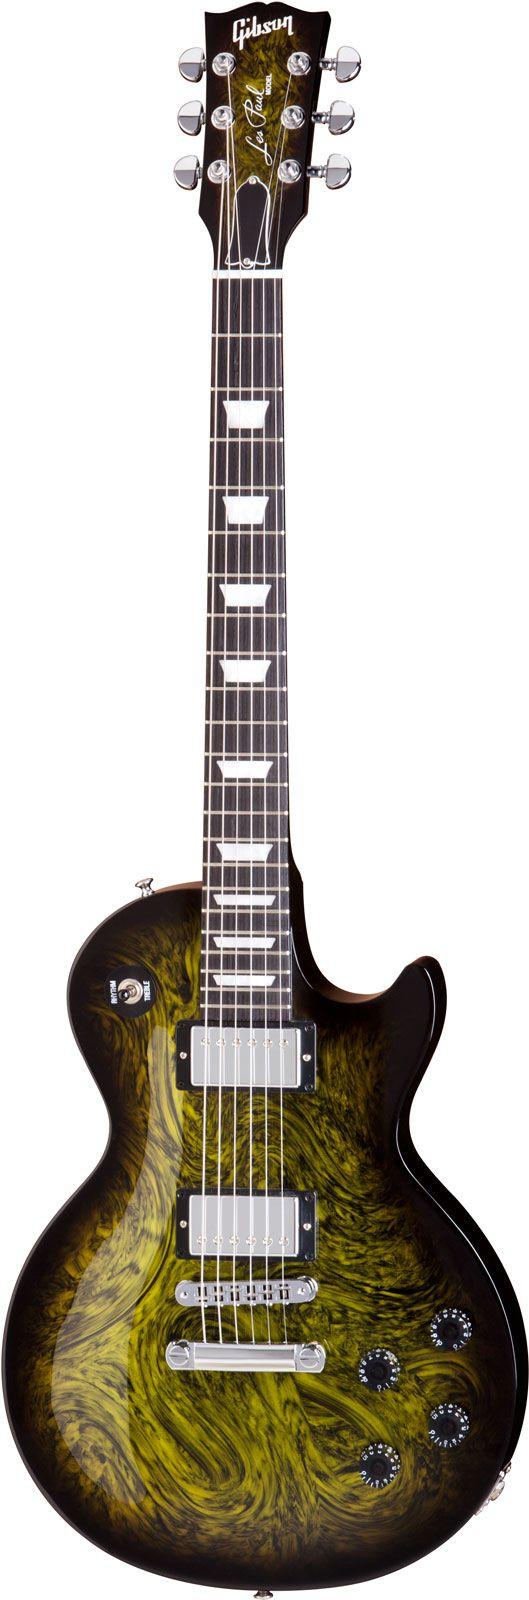 Gibson Les Paul Studio in Swirl Green Swirl Burst